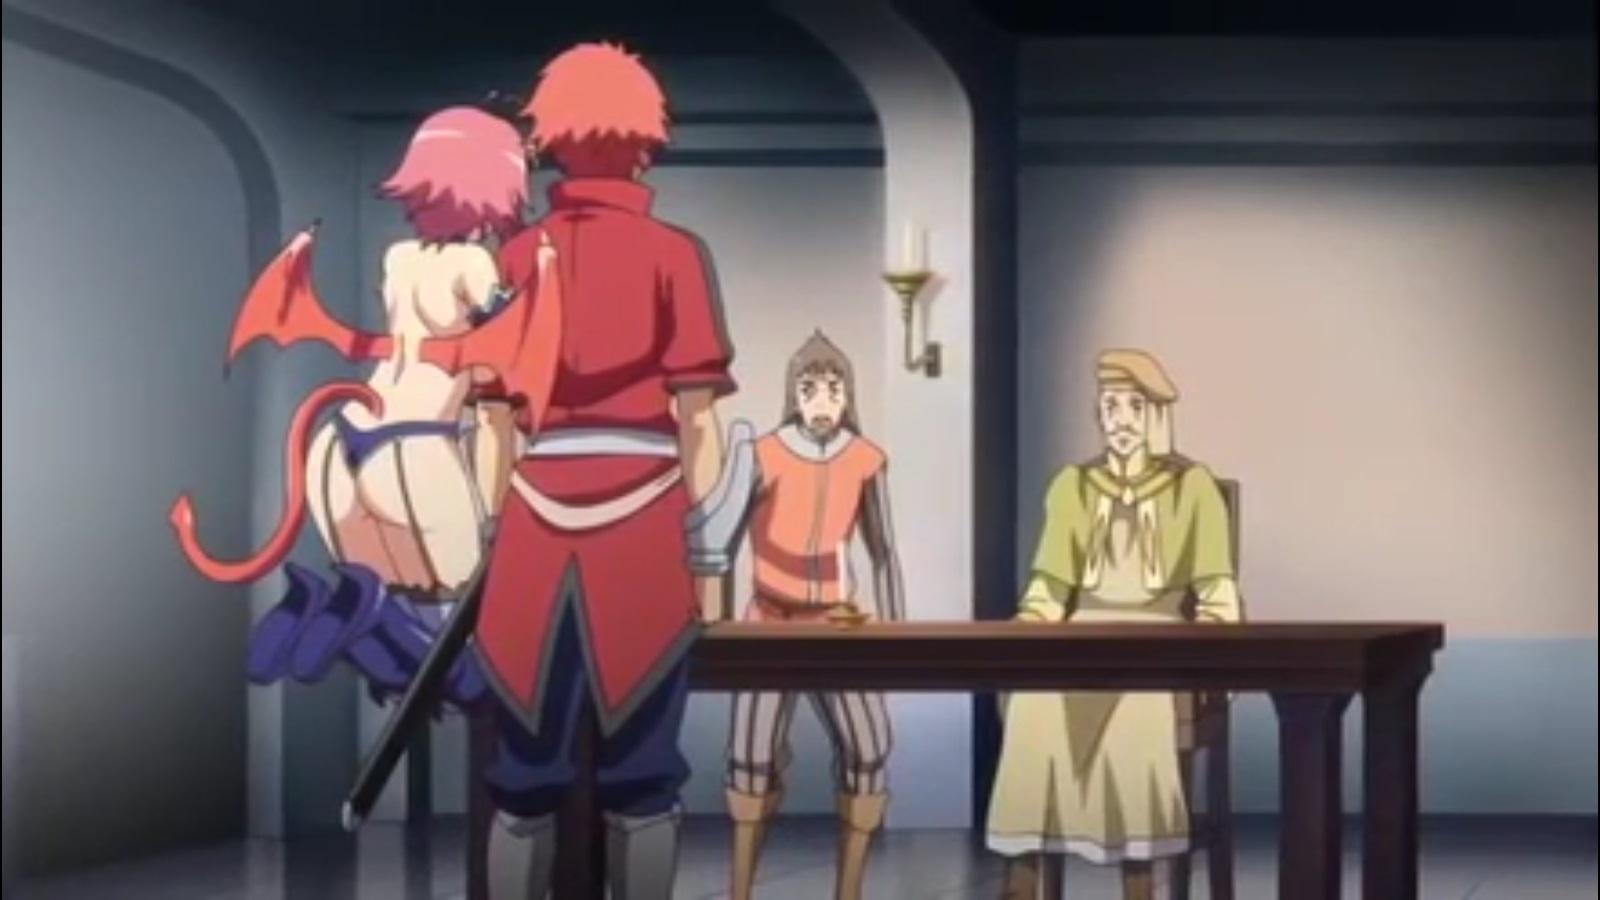 anime kyonyuu fantasy 1 cartoon porn full movie